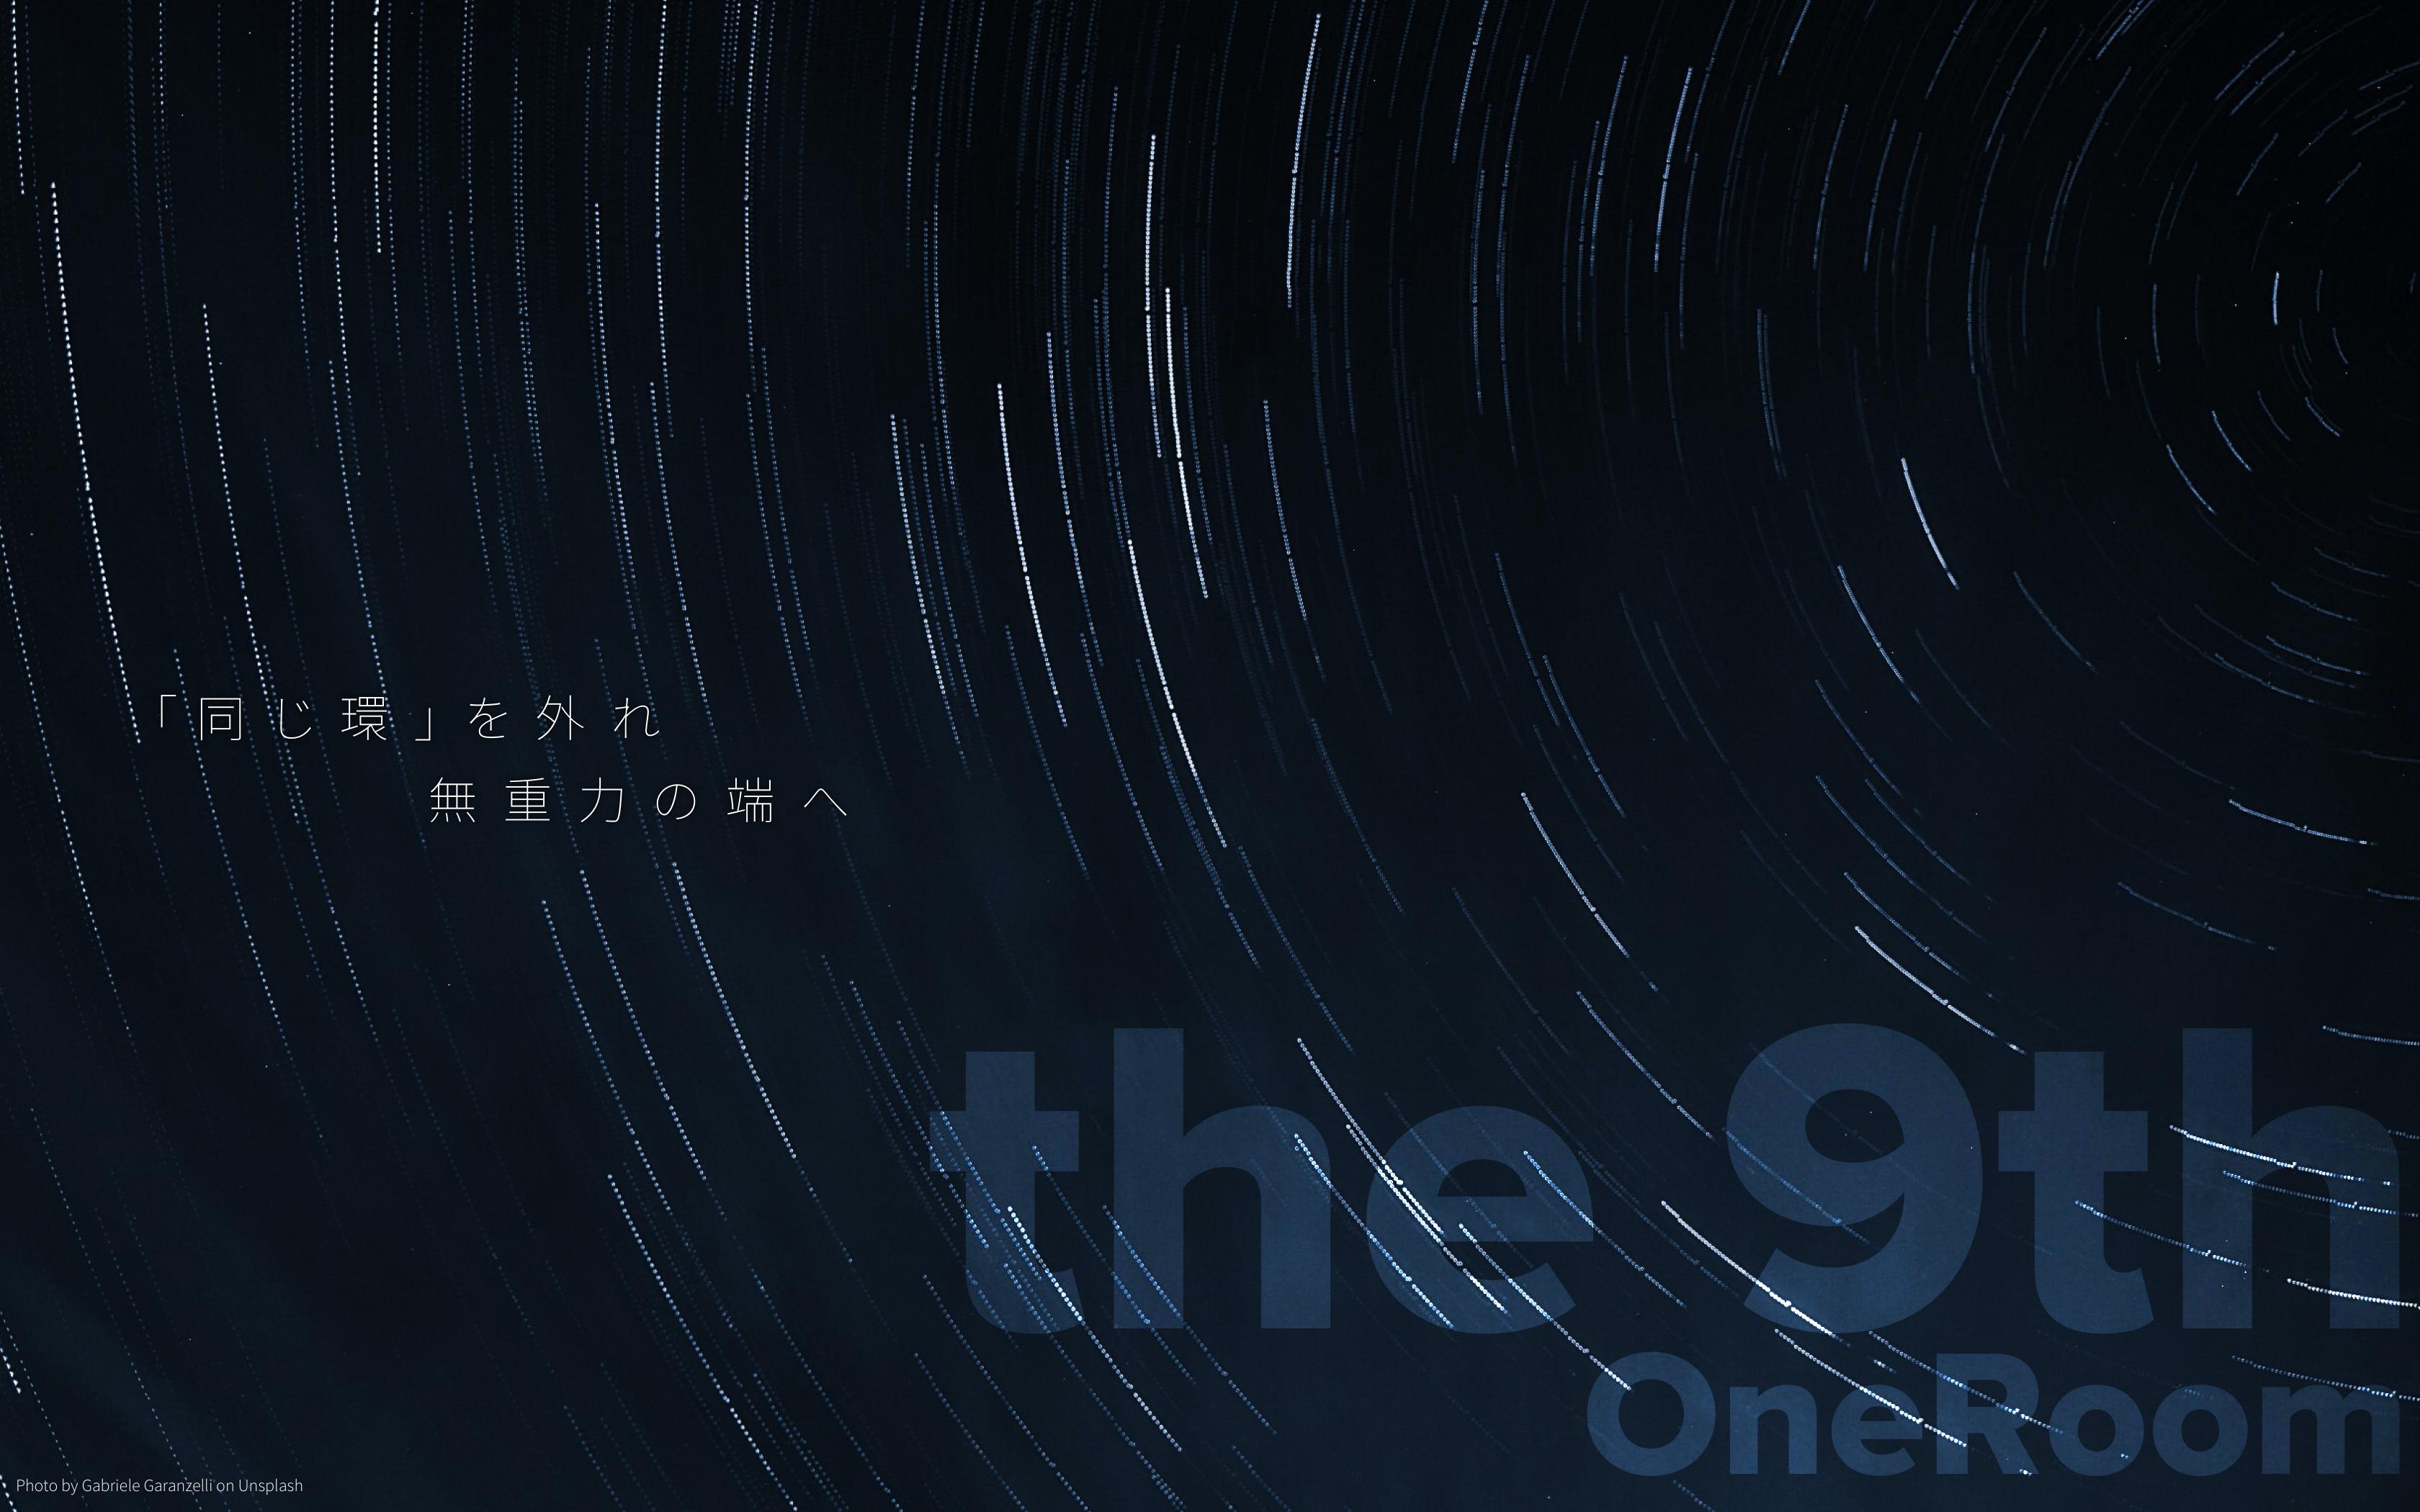 Version 2, Japanese